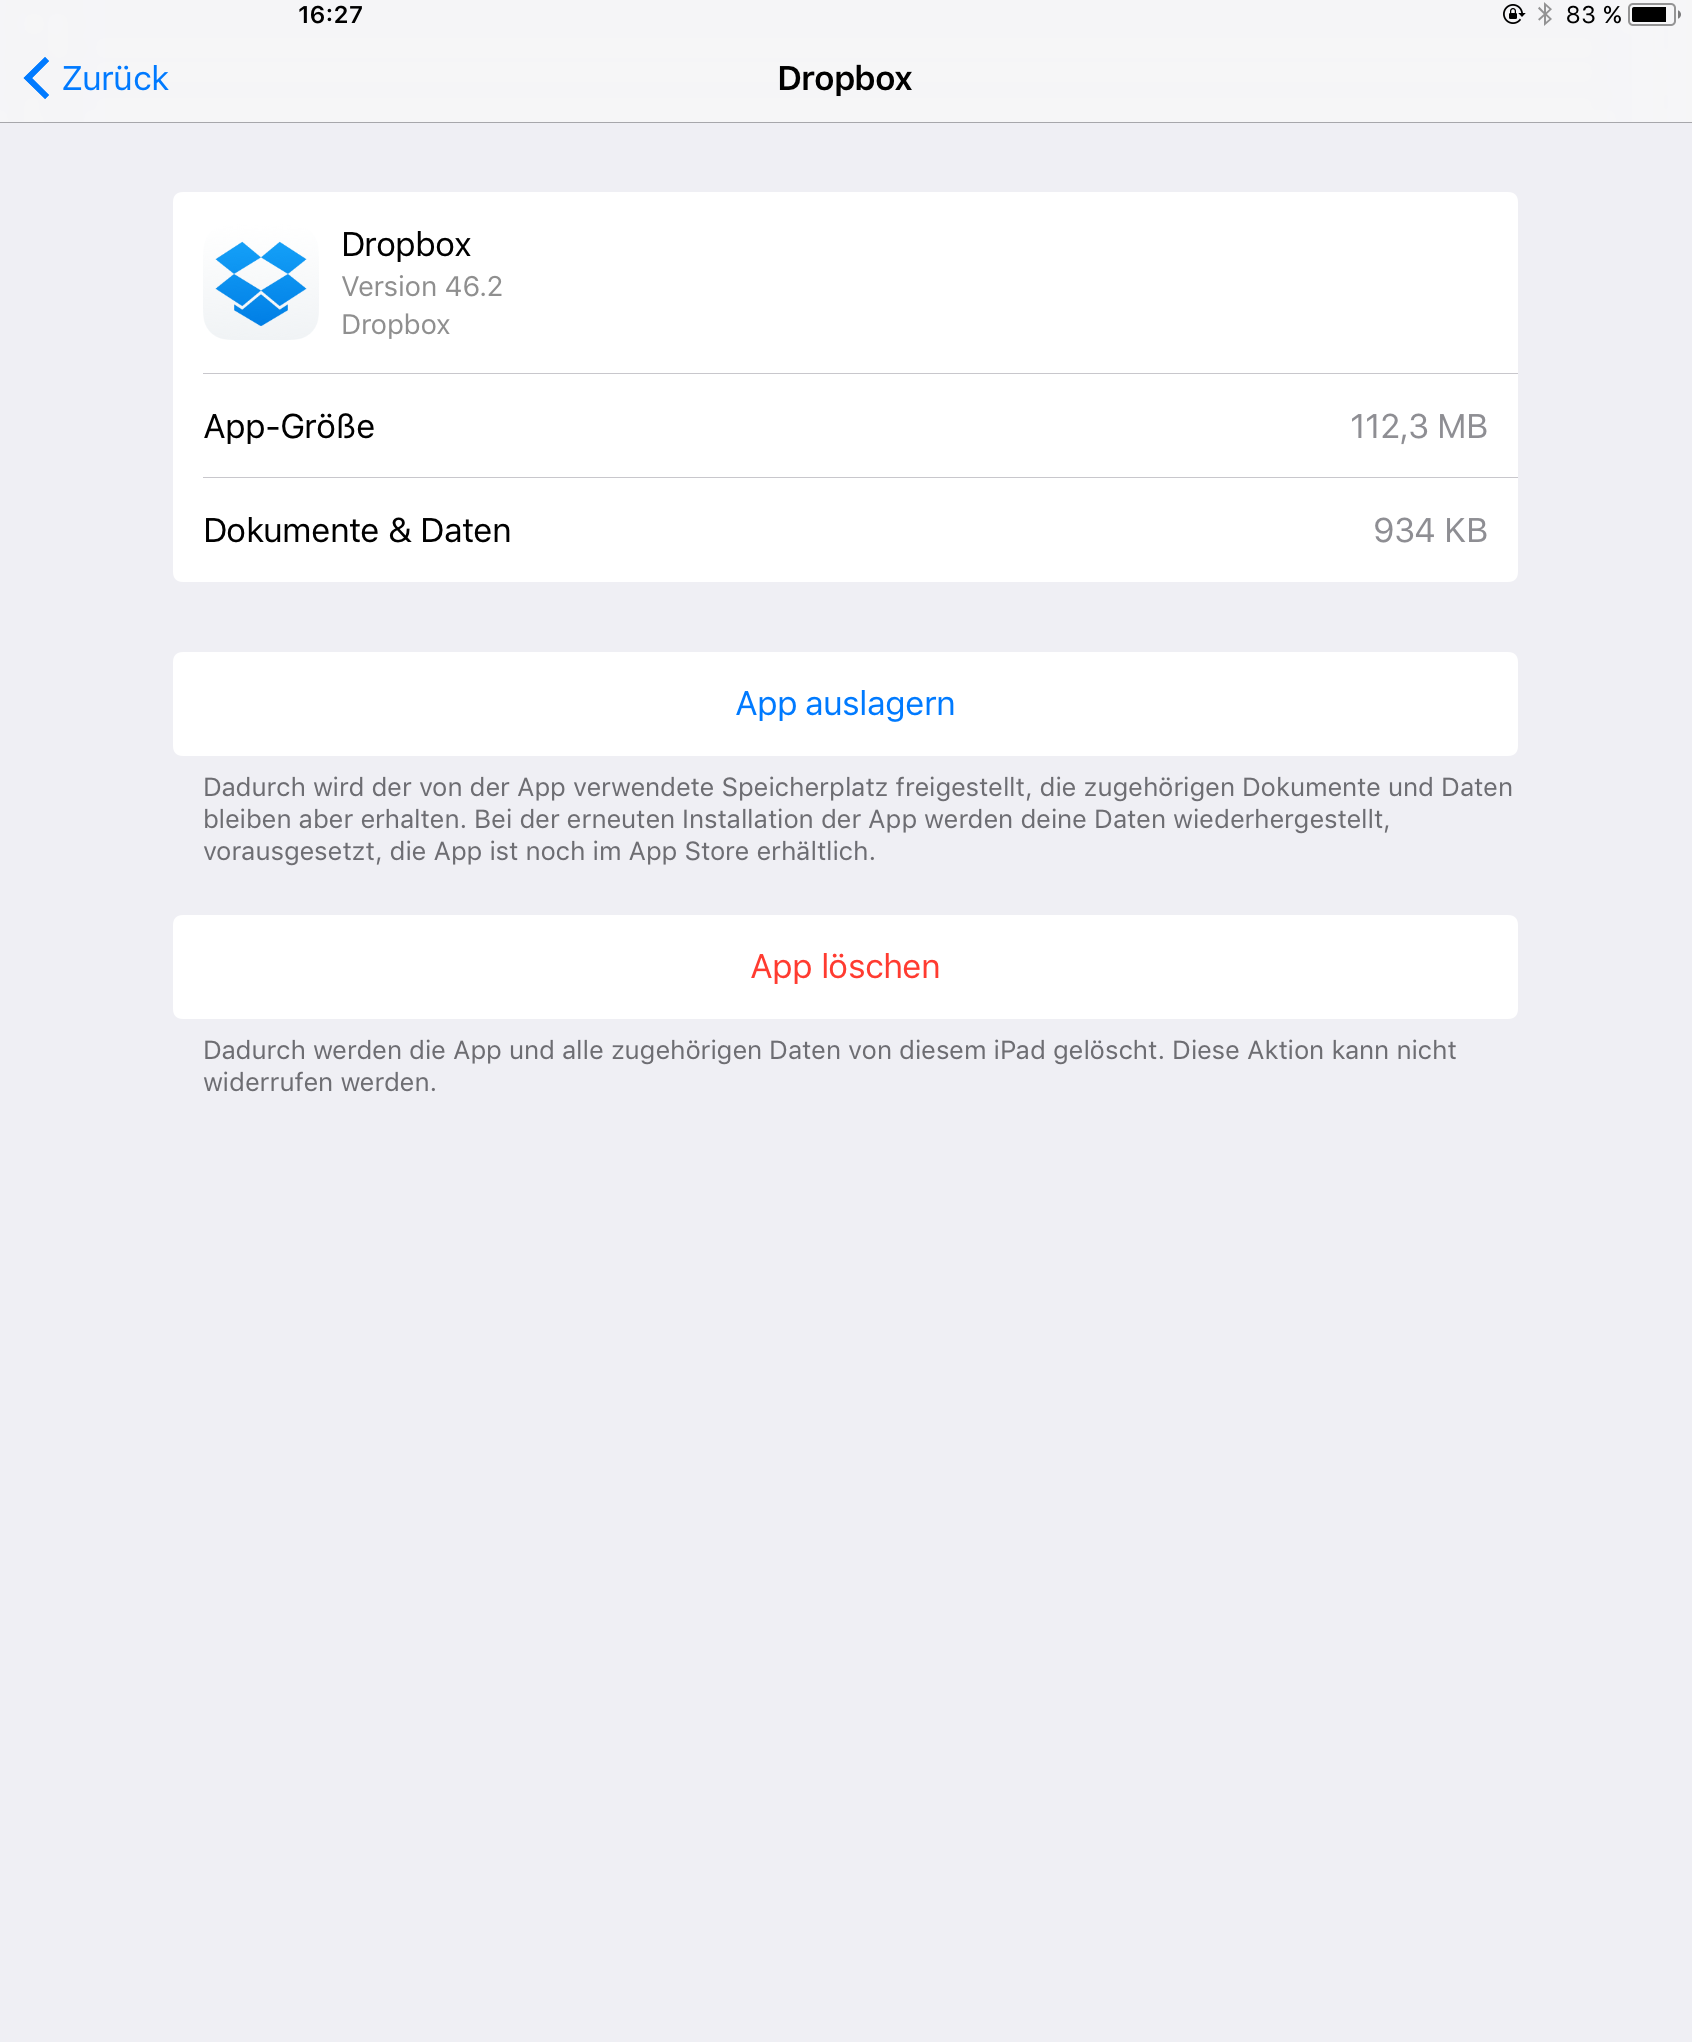 Apps endgültig löschen itunes 12